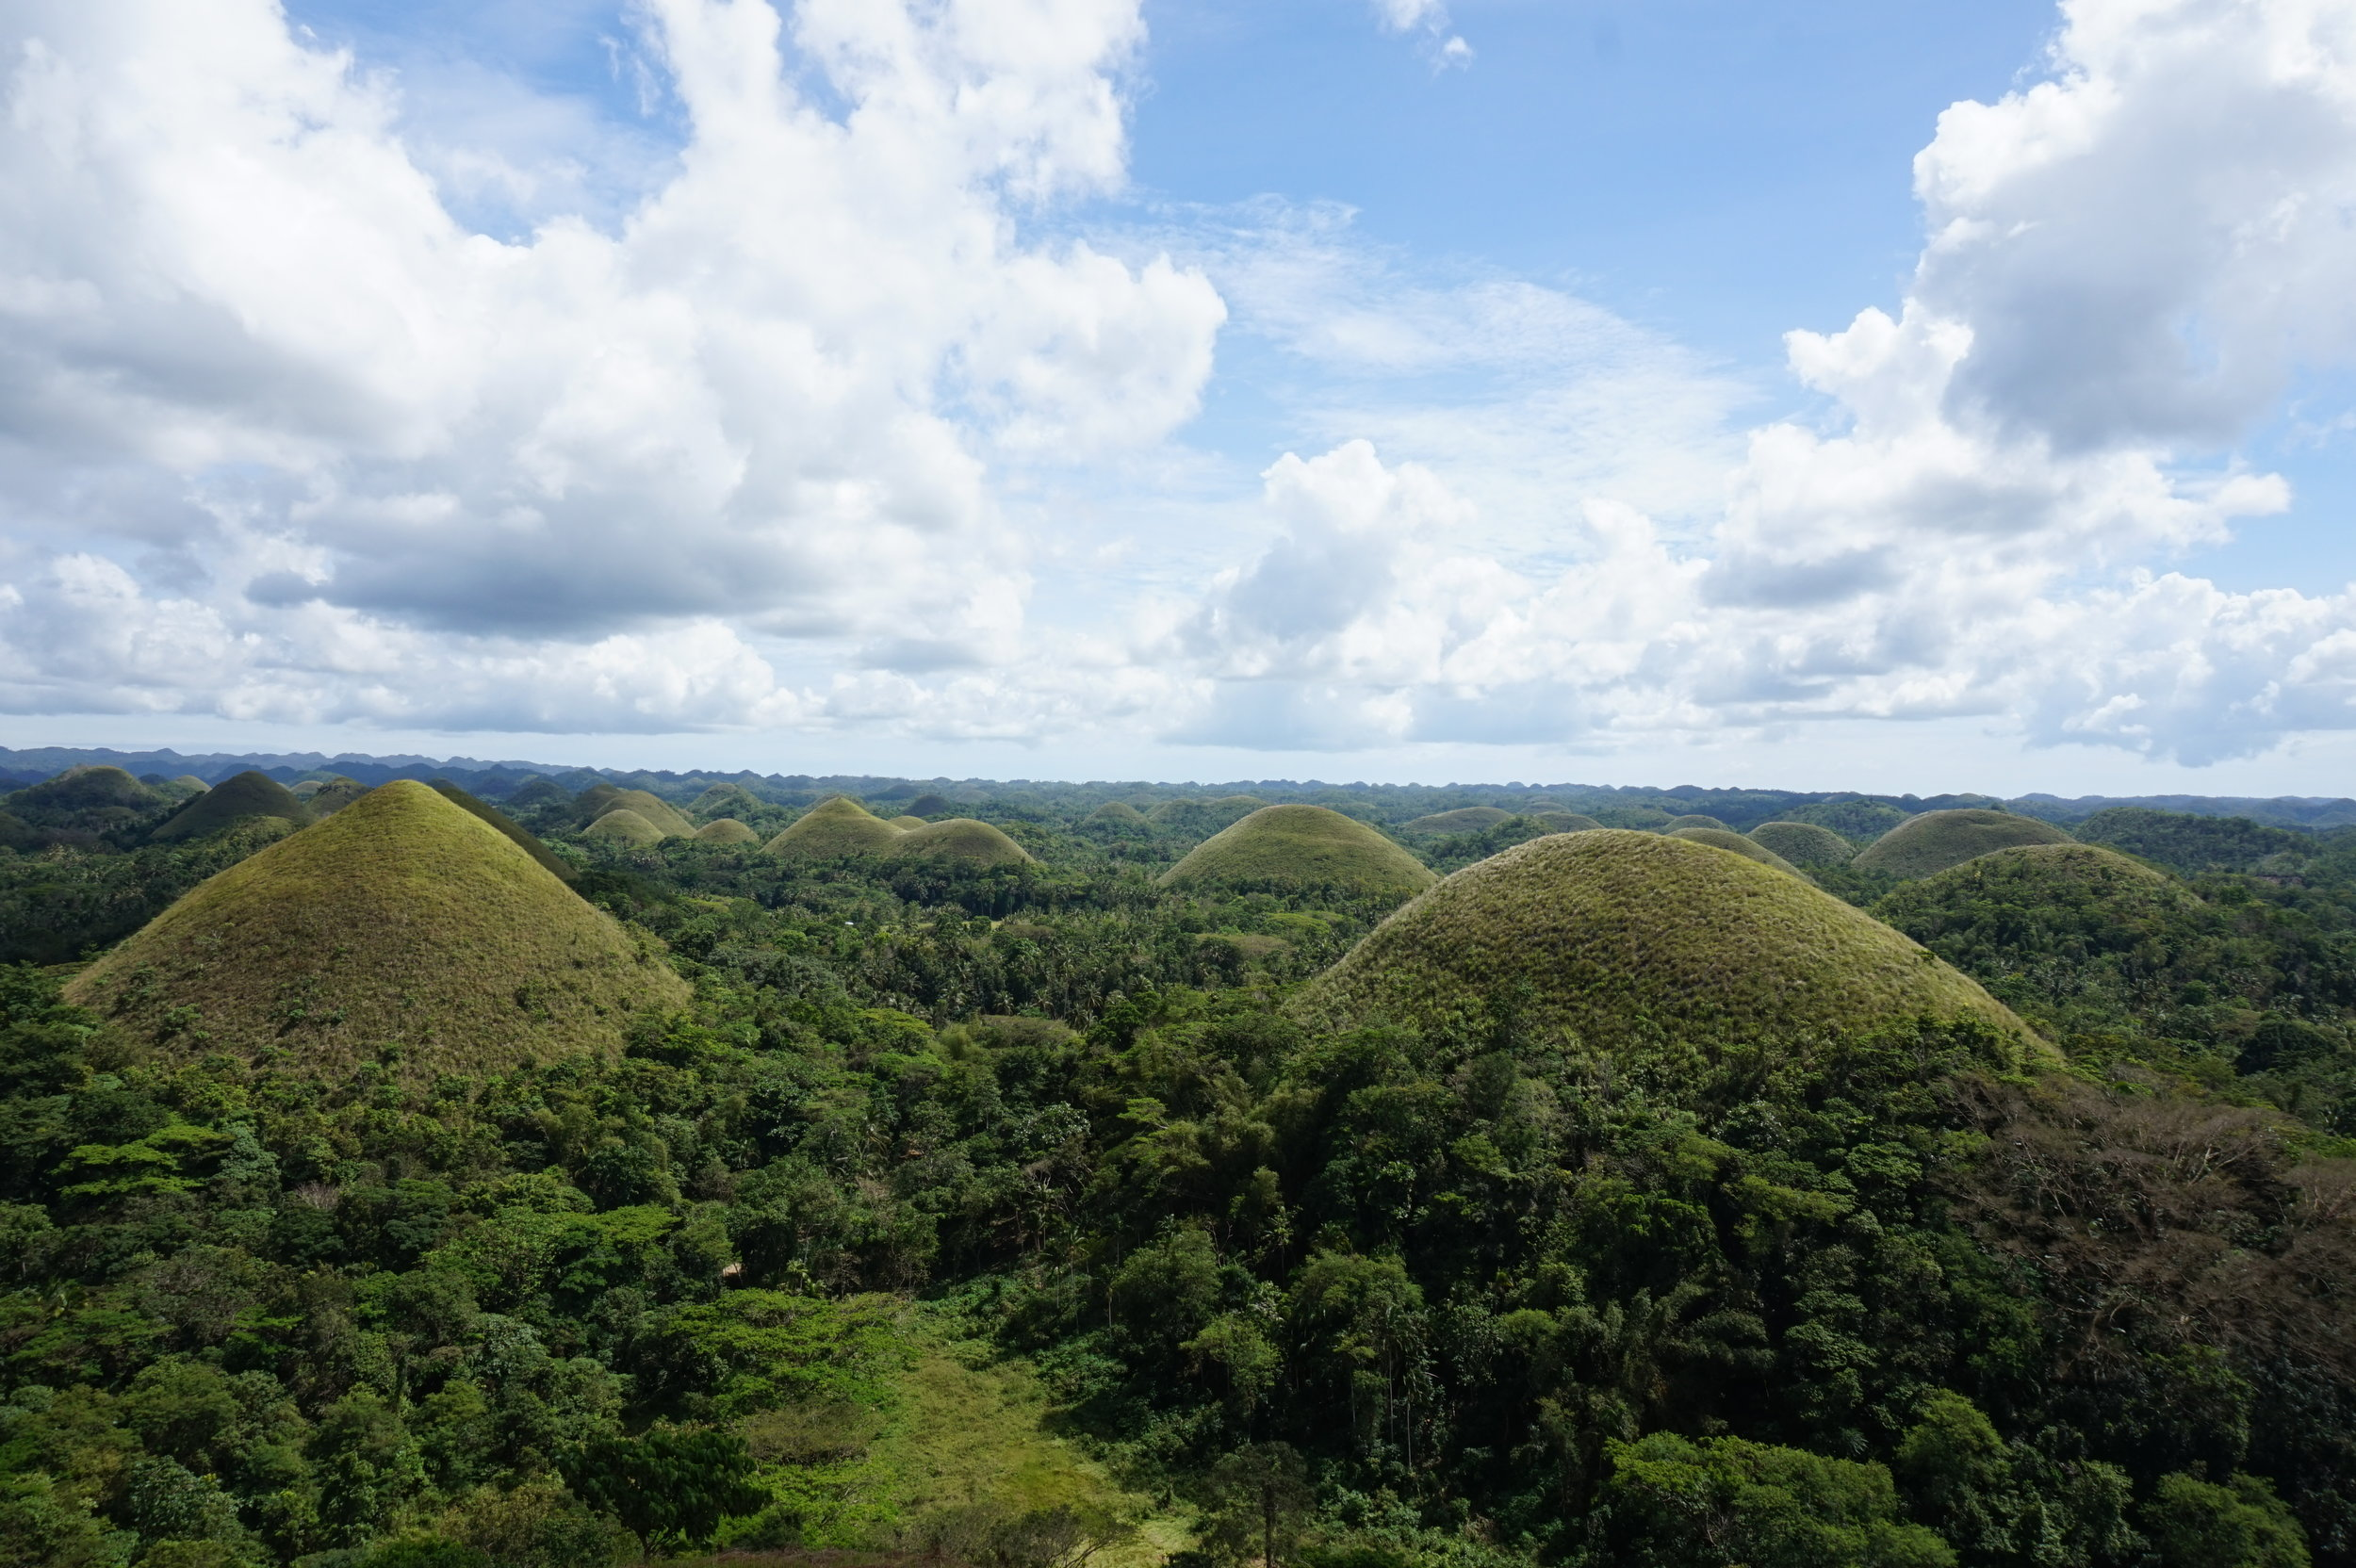 Bohol-Chocolate Hills